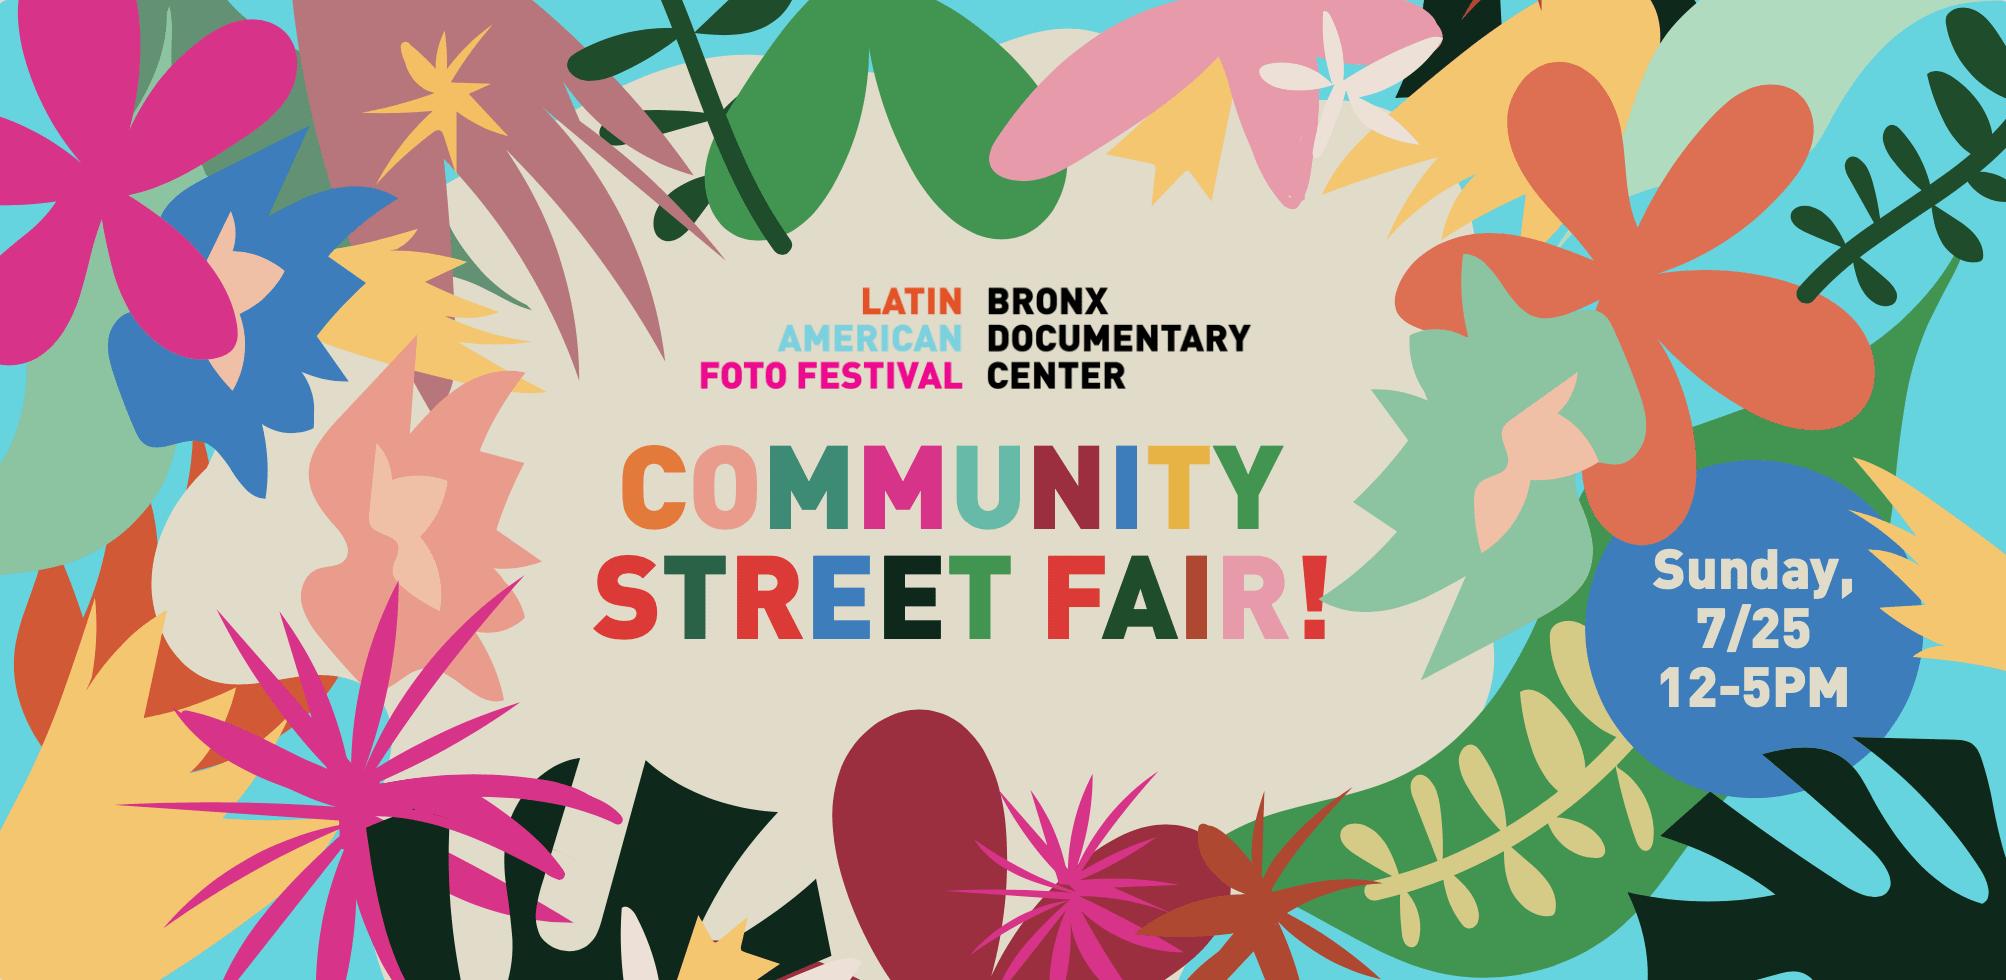 Community Street Fair